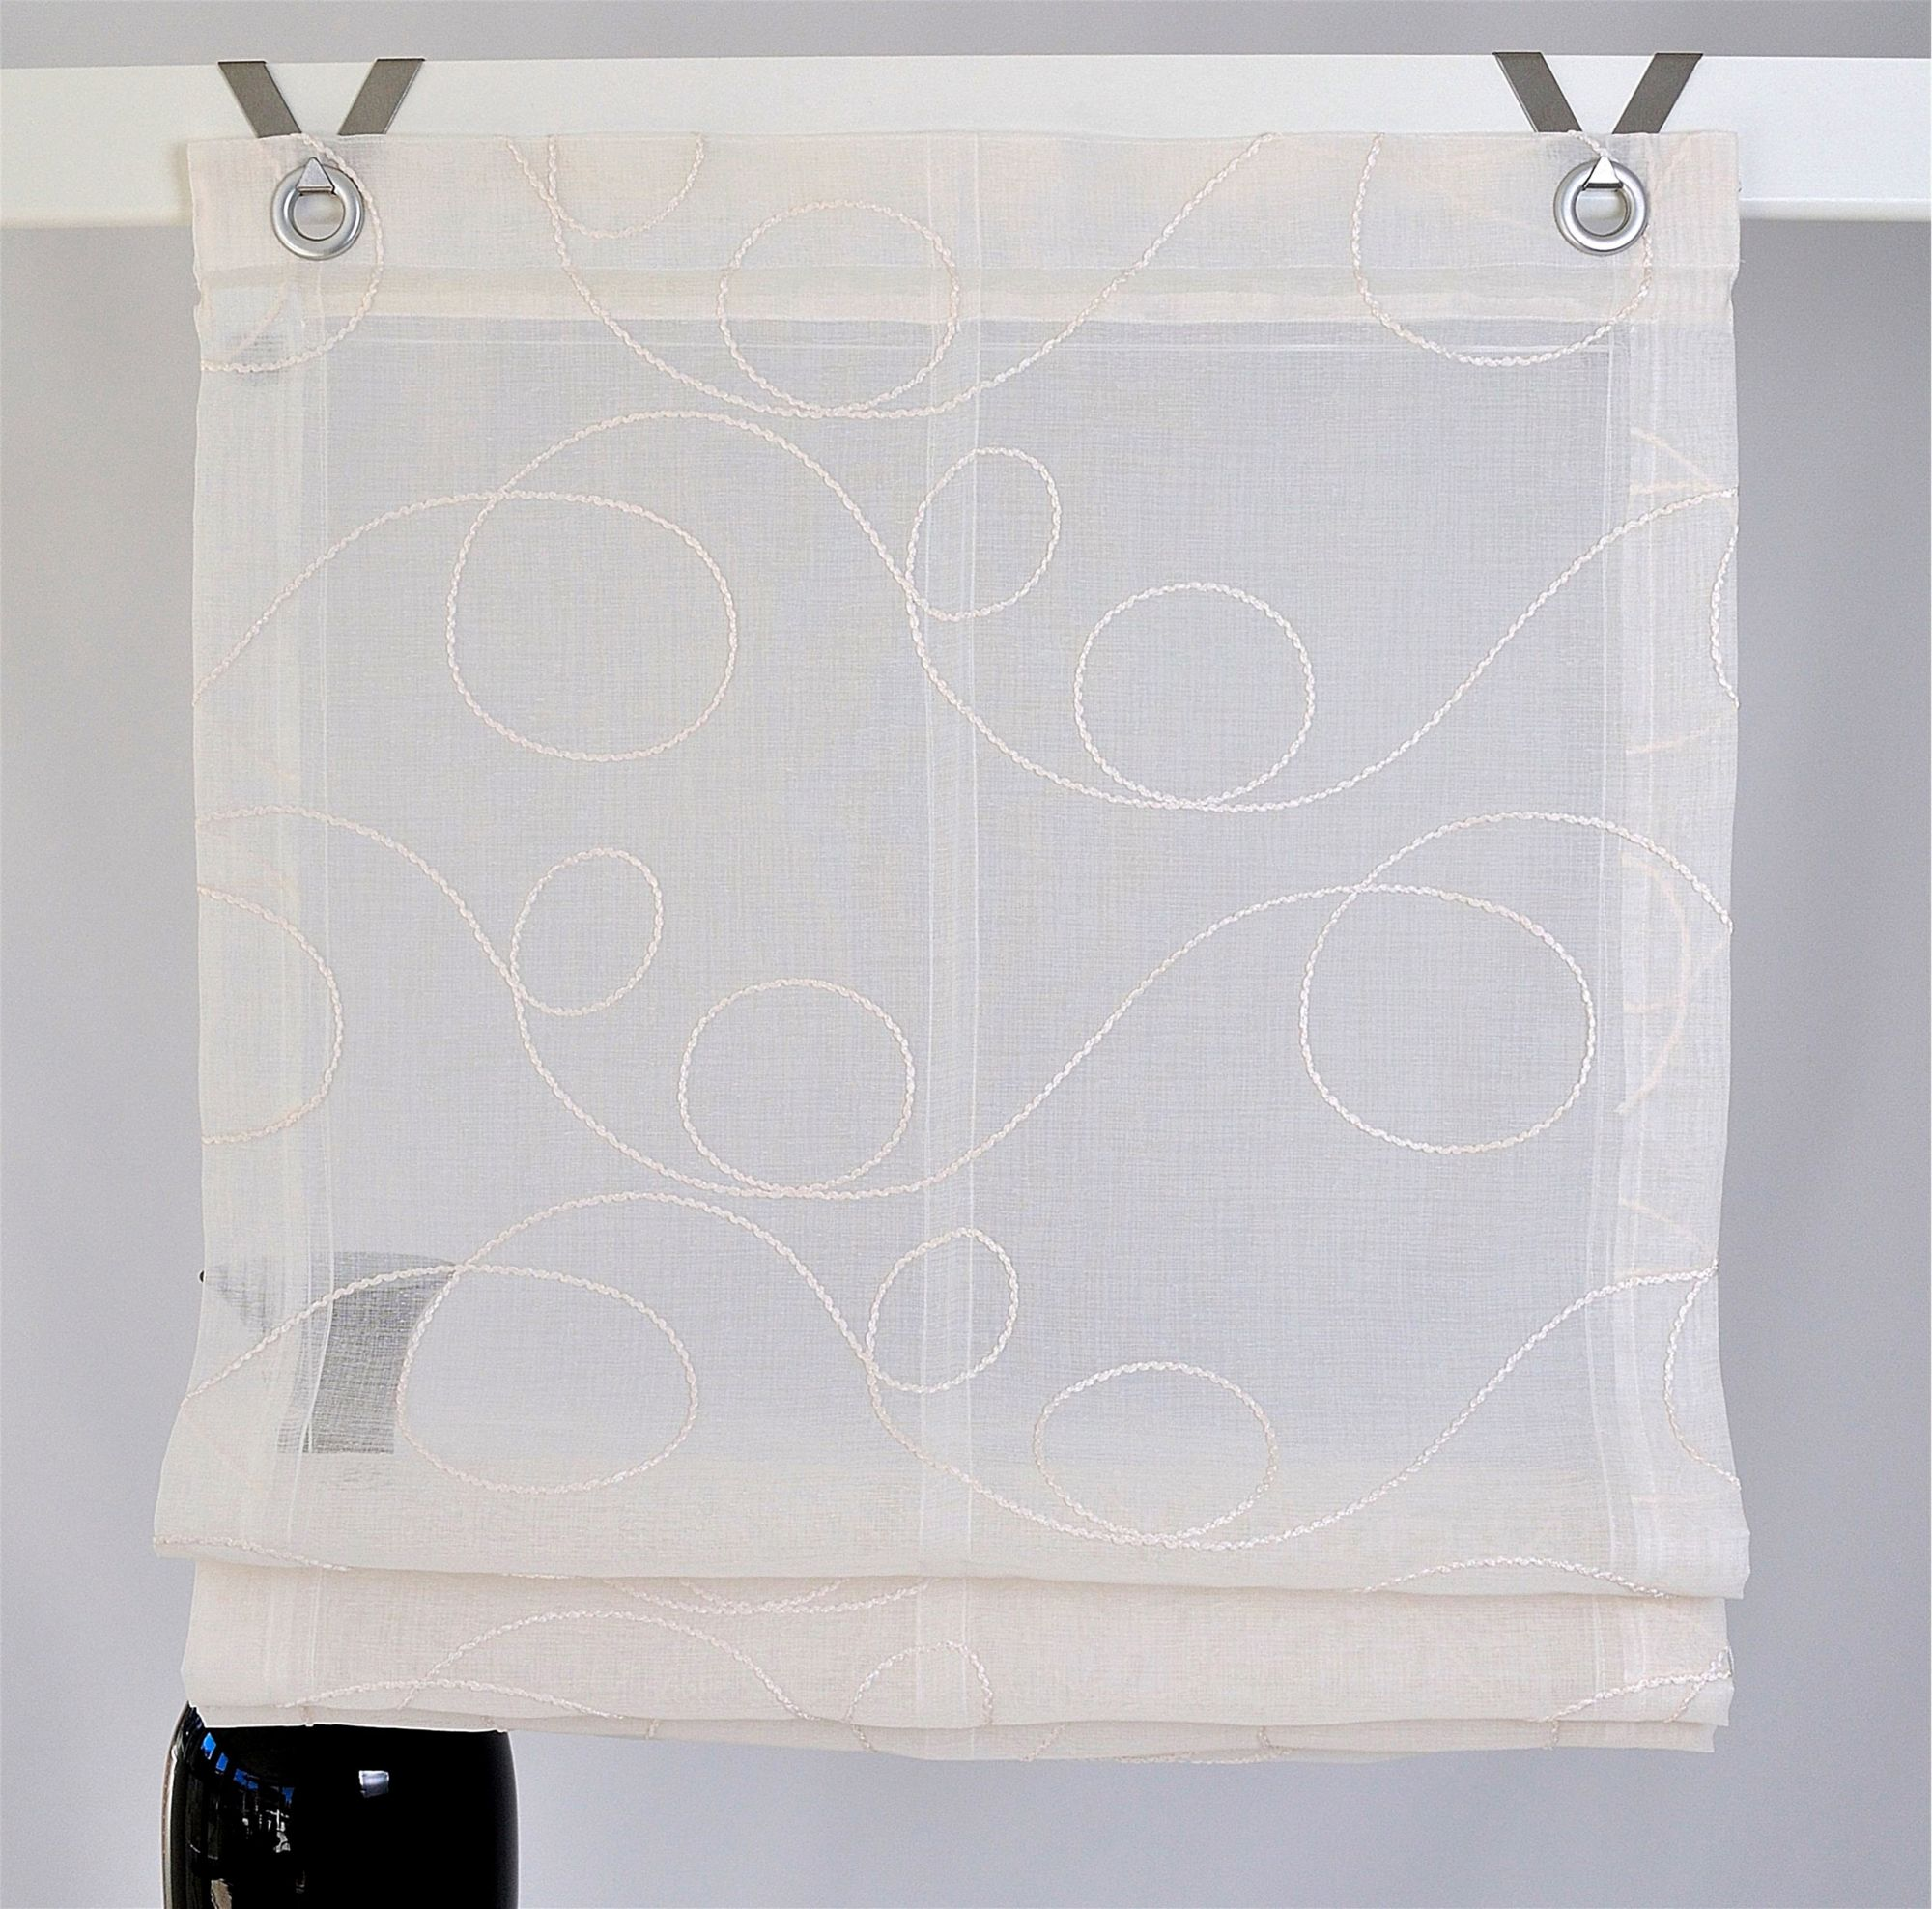 raffrollo kutti jasmin 1er pack ohne bohren schwab. Black Bedroom Furniture Sets. Home Design Ideas